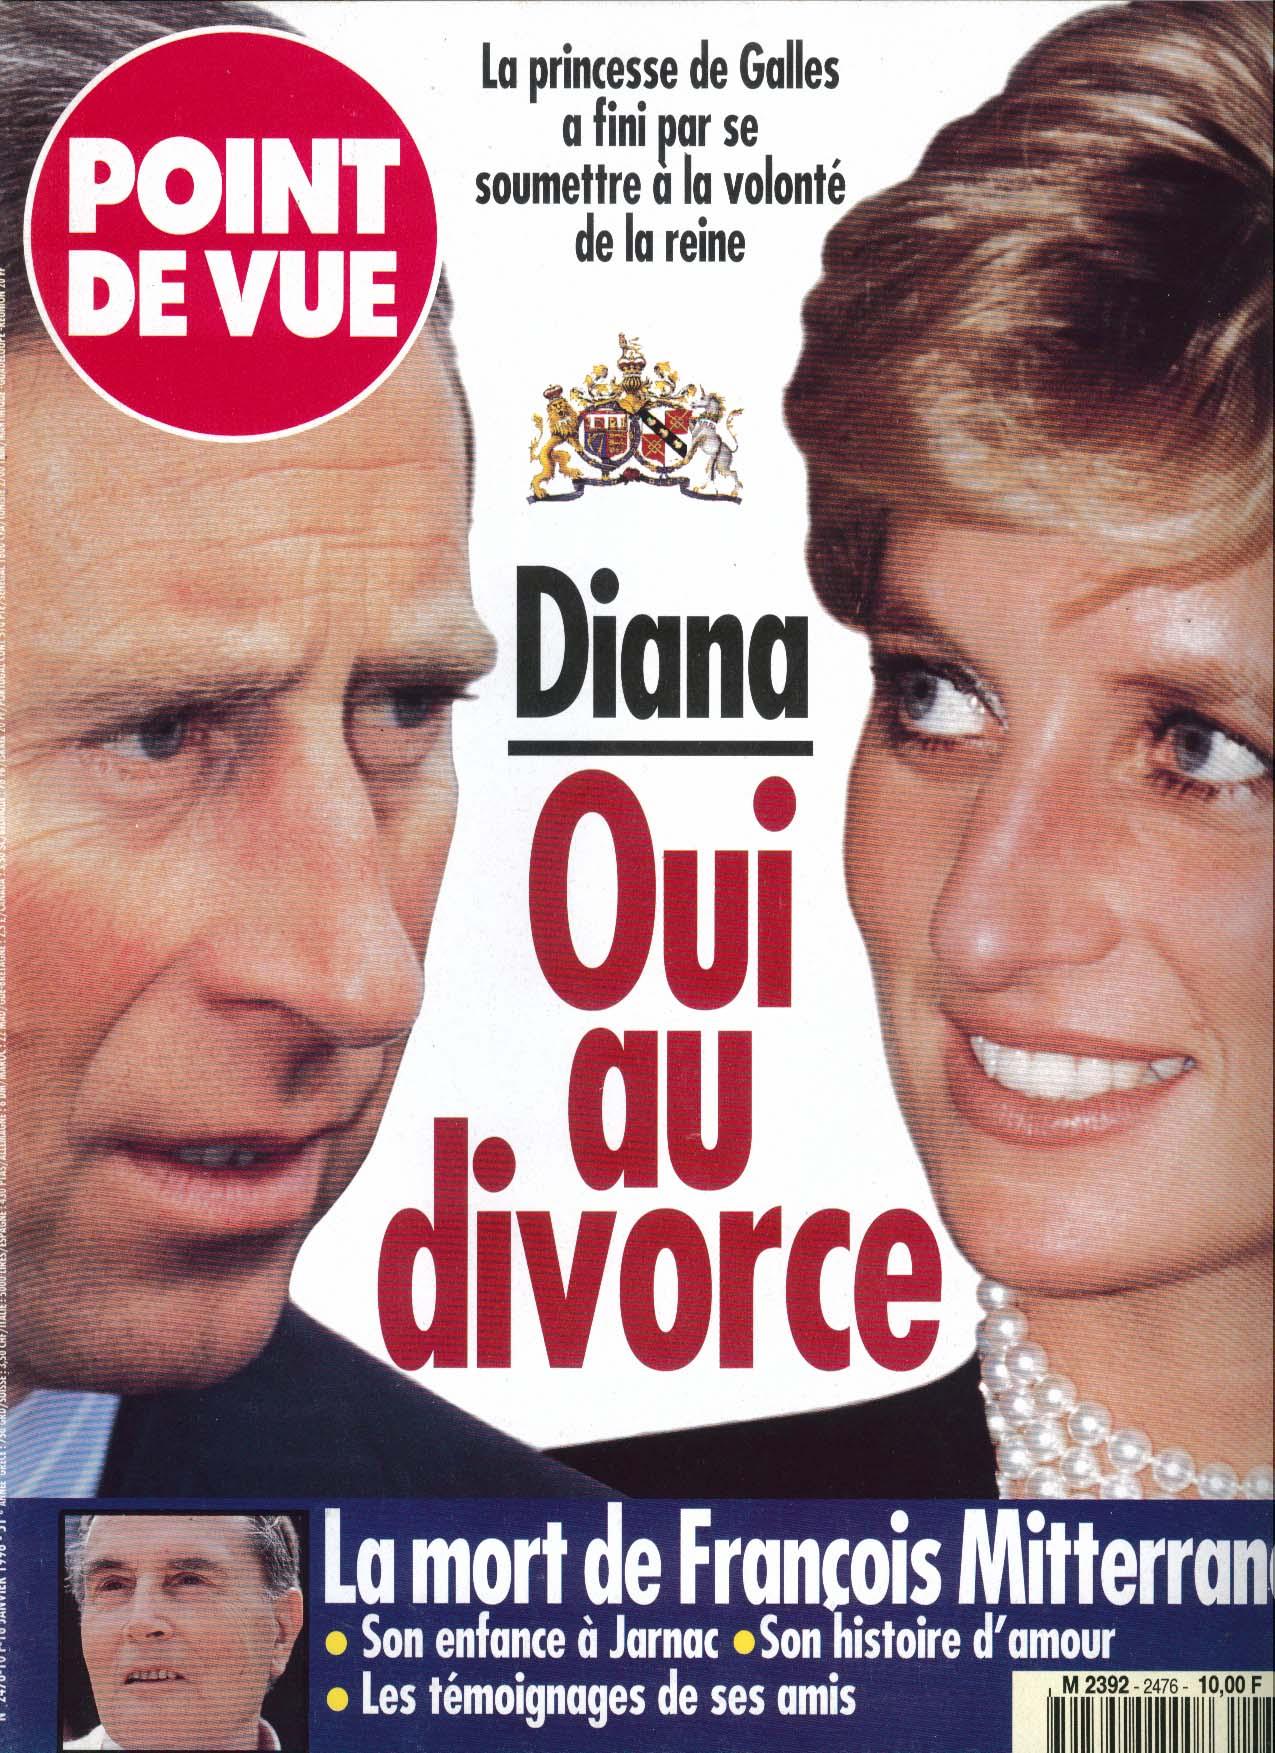 Image for POINT DE VUE Prince Charles Princess Diana Divorce 1 1996